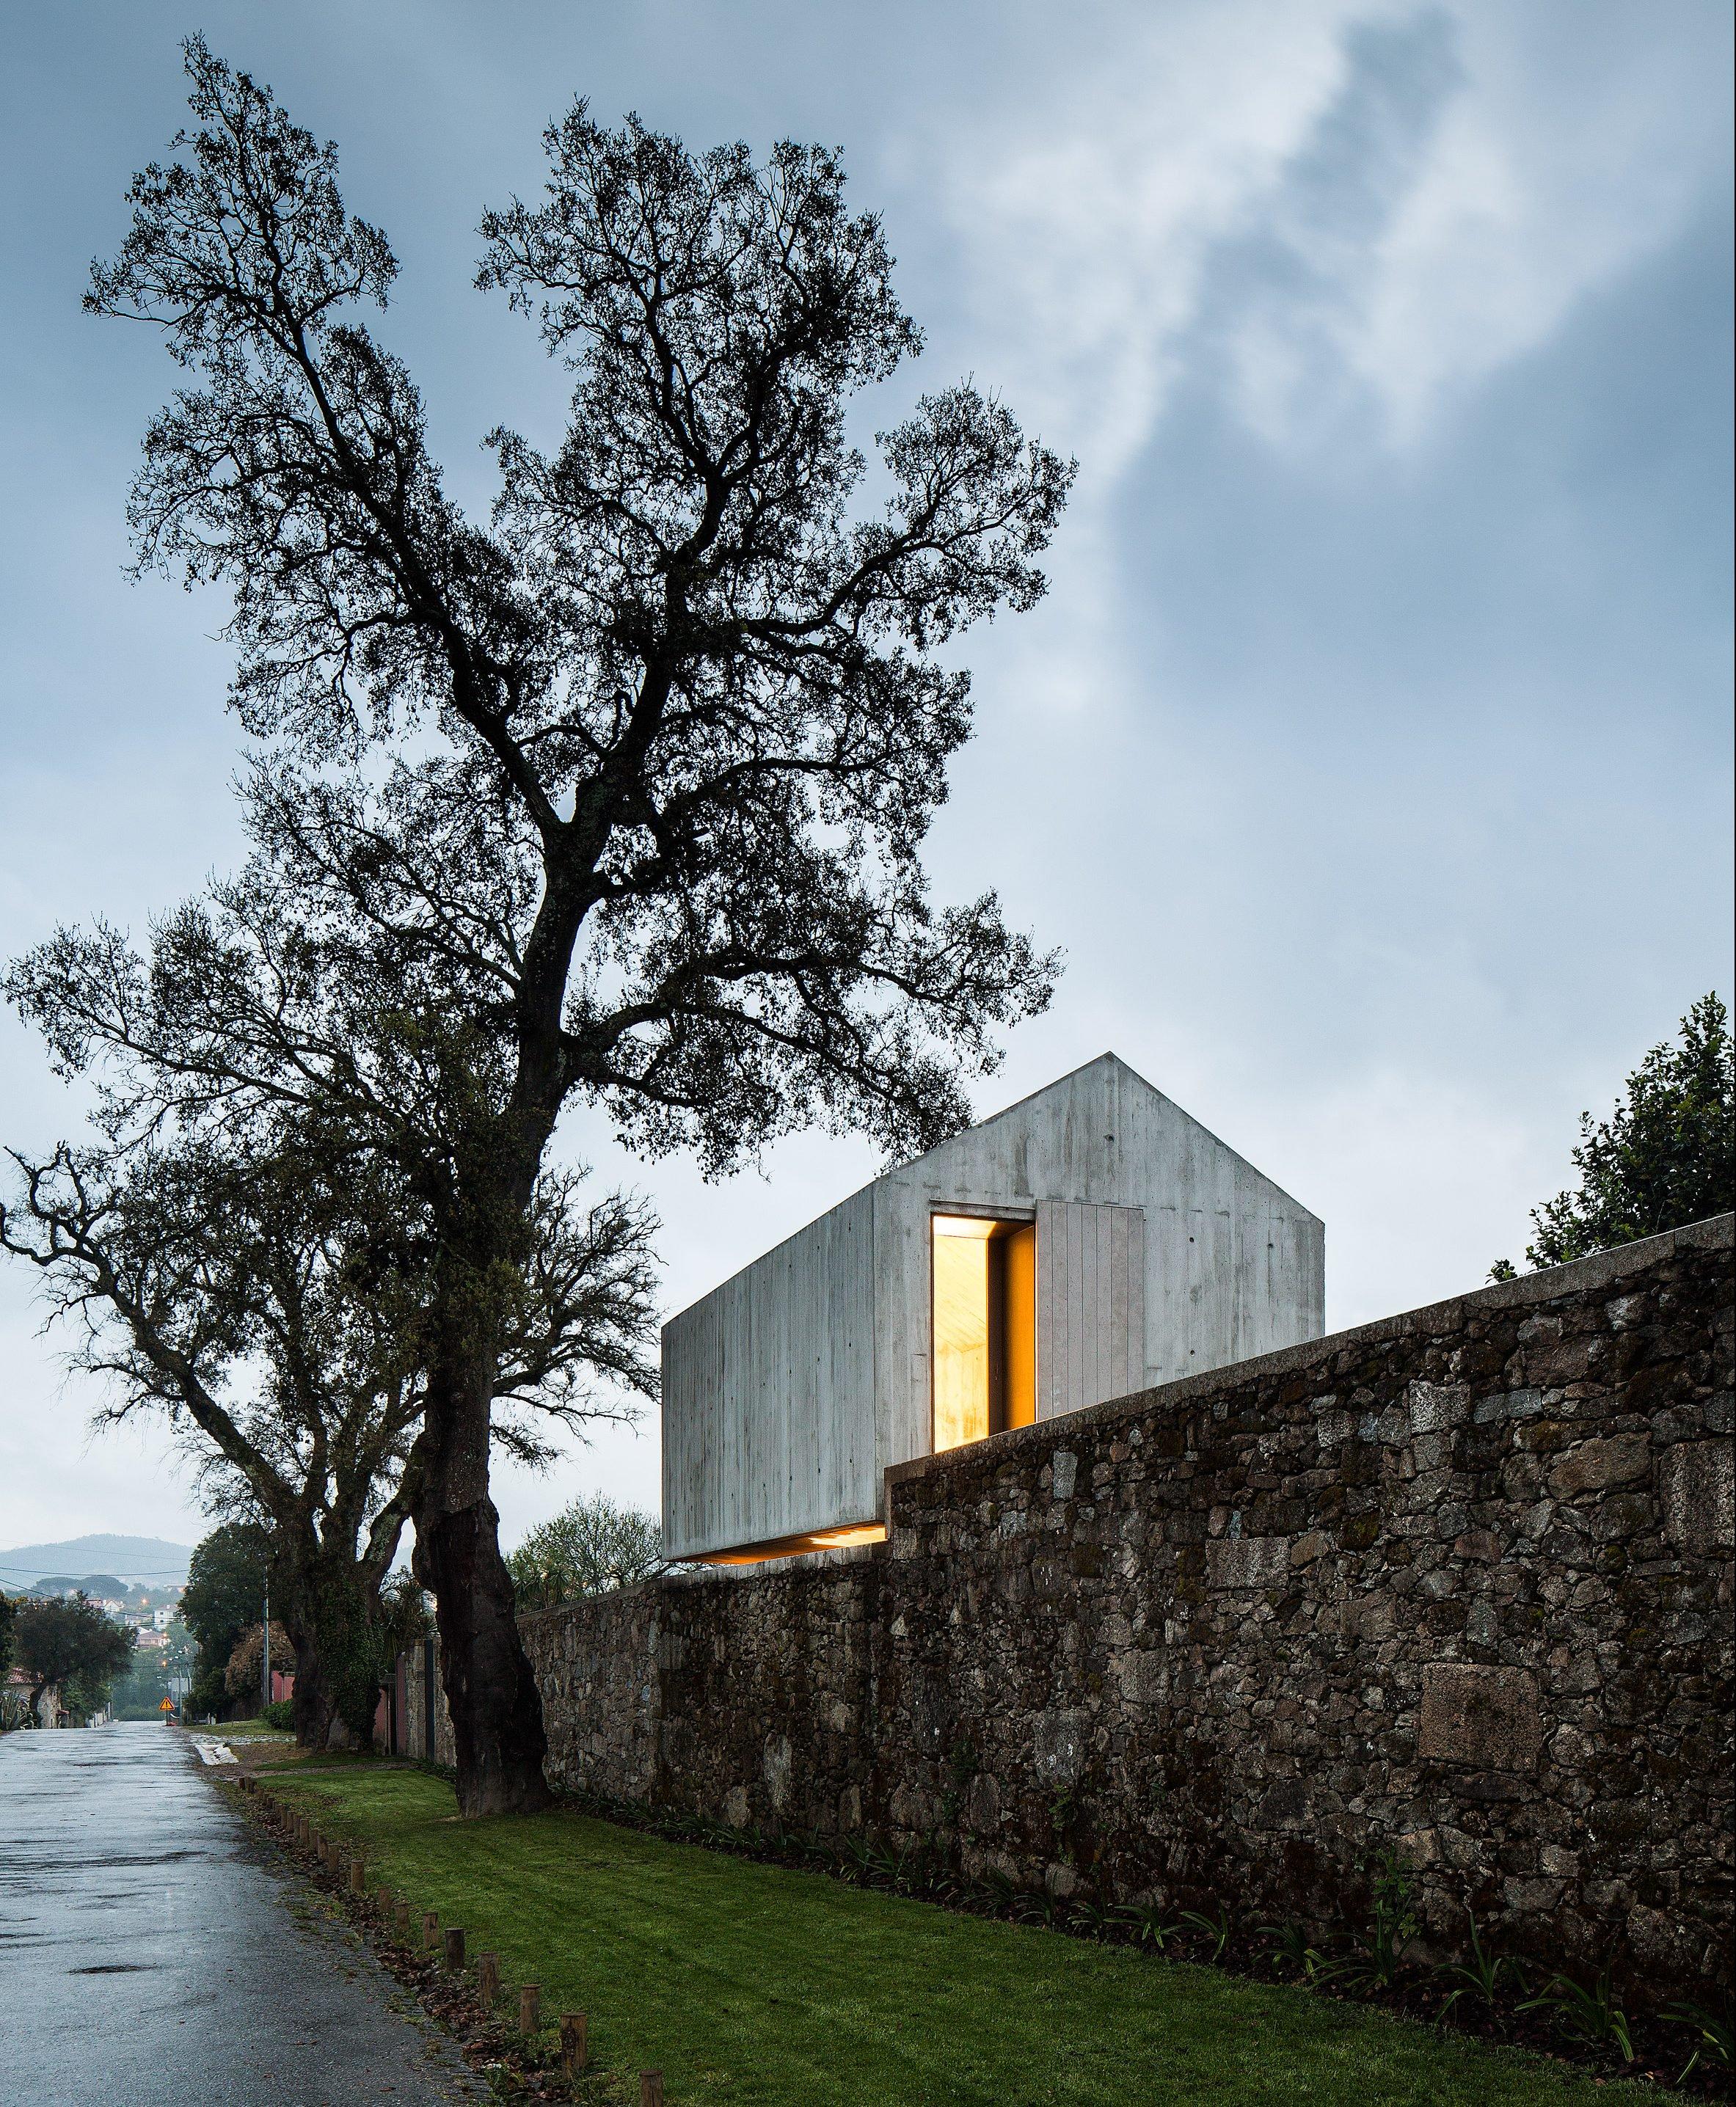 Casa de concreto armado suspensa. #arquitetura #concretoarmado